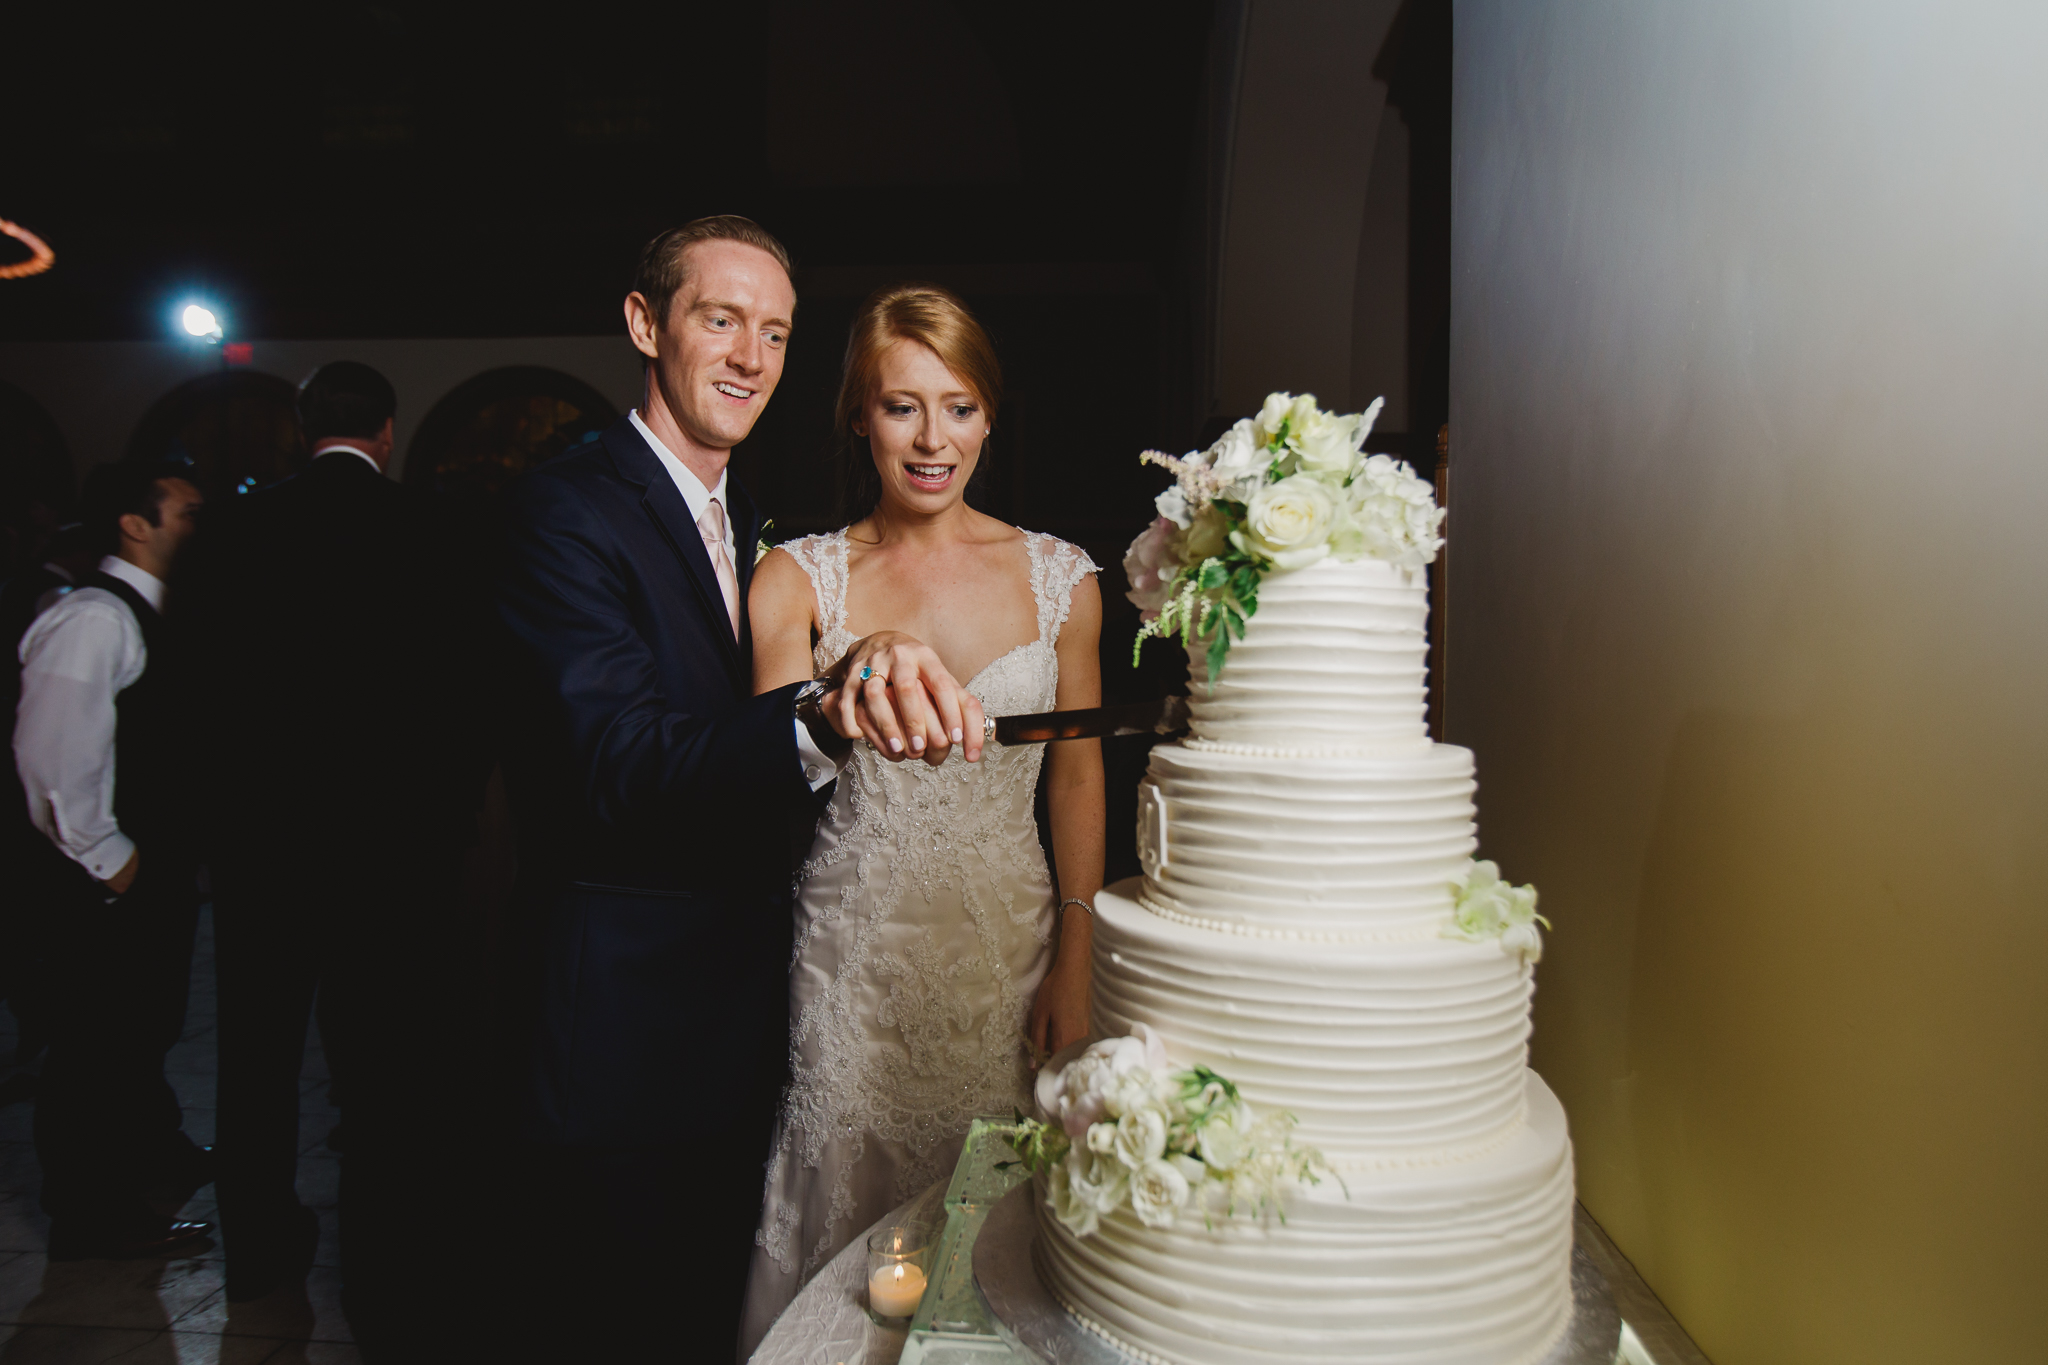 Michael and Kelly - the ashton depot - wedding DFW - wedding photographer- elizalde photography (117 of 150).jpg